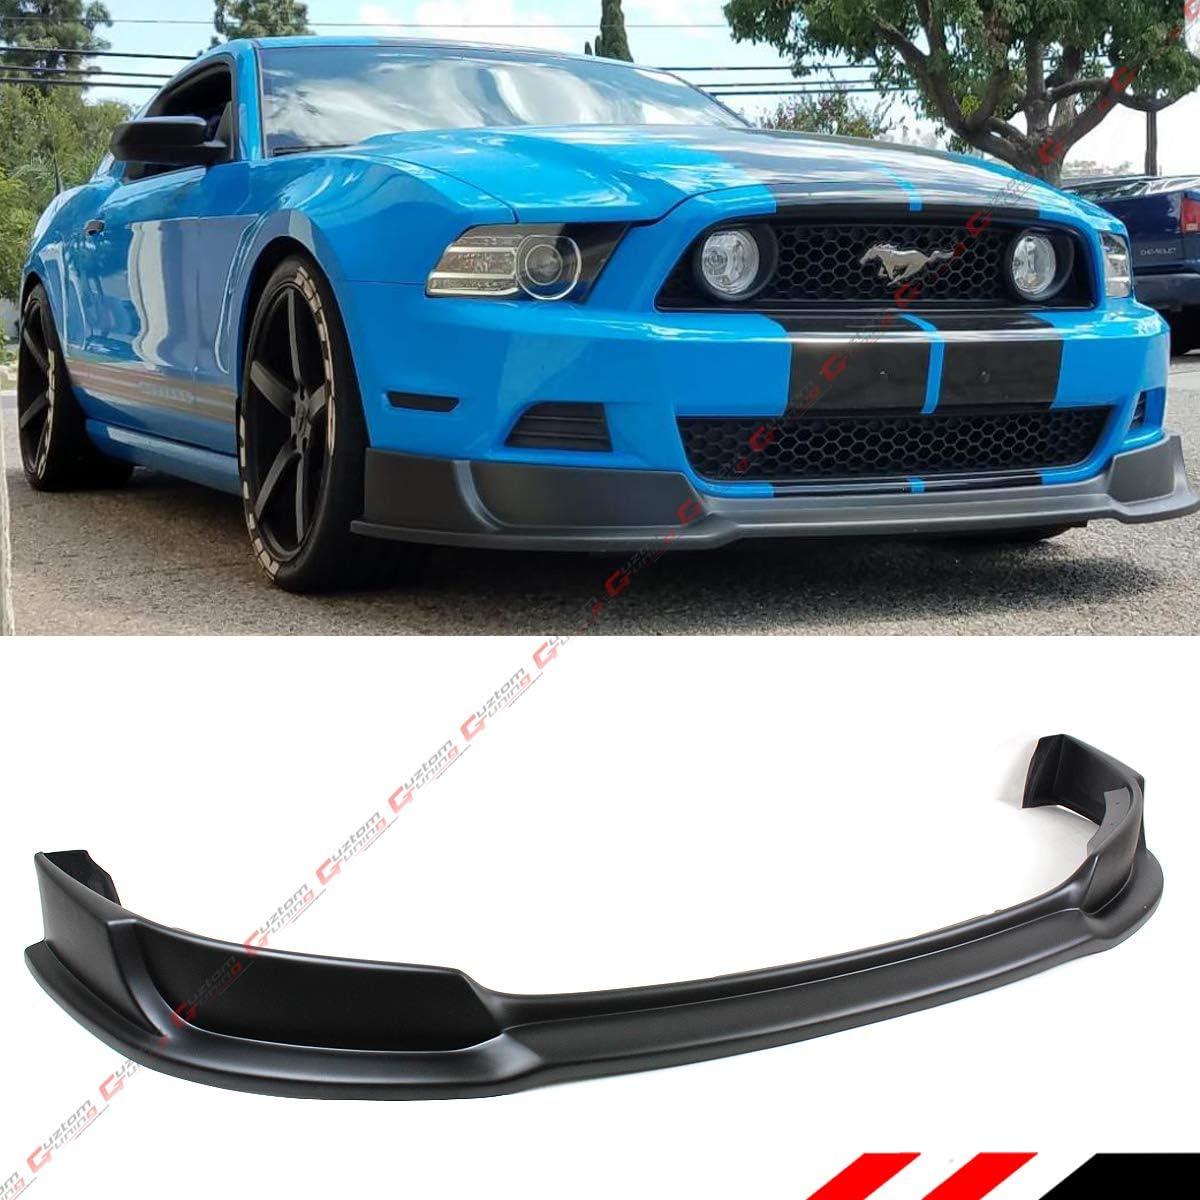 Fits 2013-2014 Ford Mustang V6 V8 GT RTR Sty PU Front Bumper Lip Spoiler Black